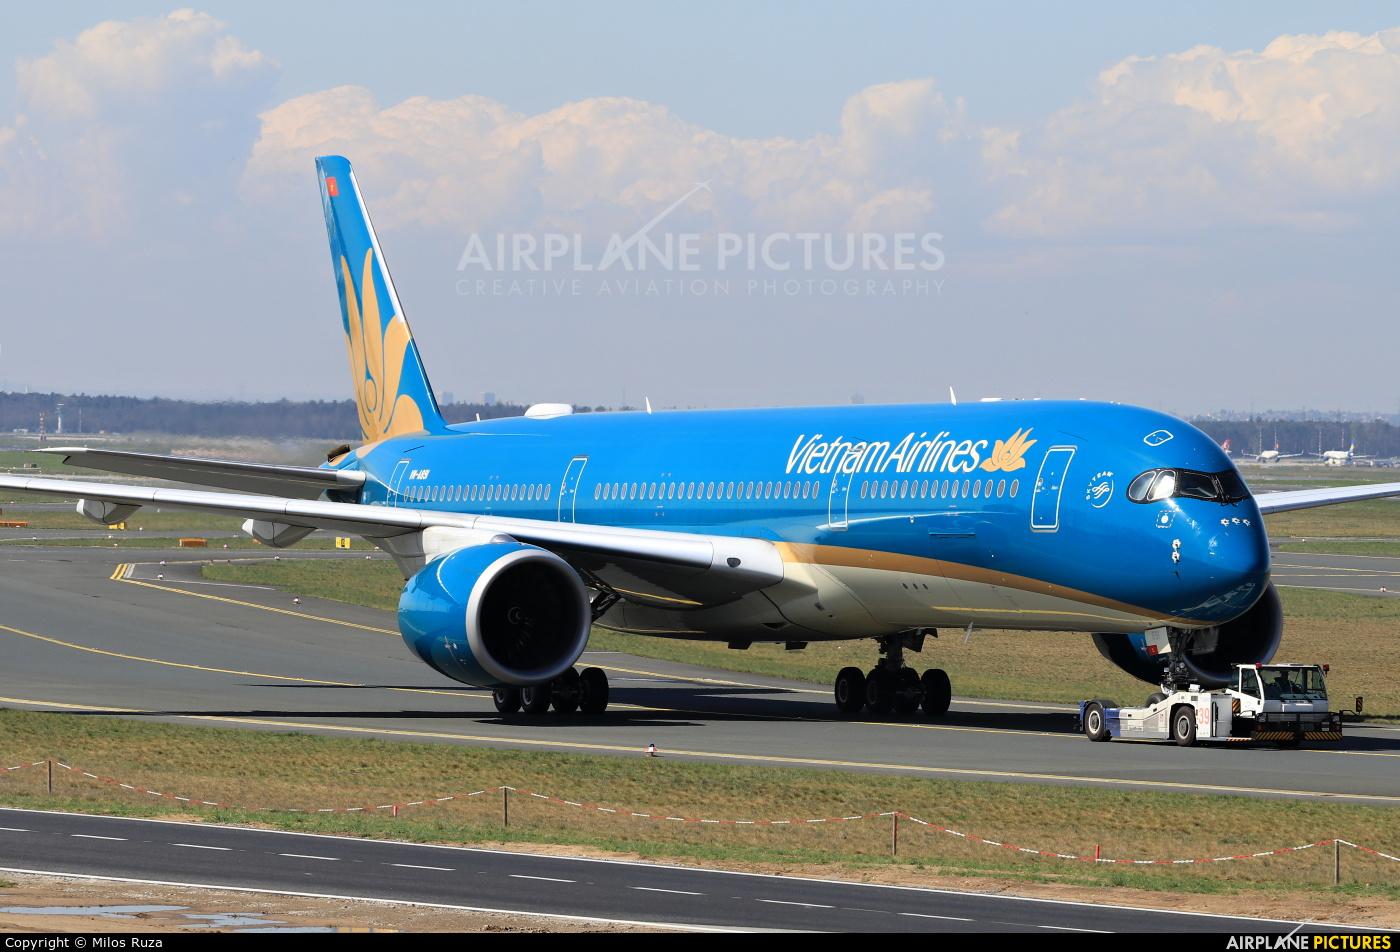 Vietnam Airlines VN-A891 aircraft at Frankfurt